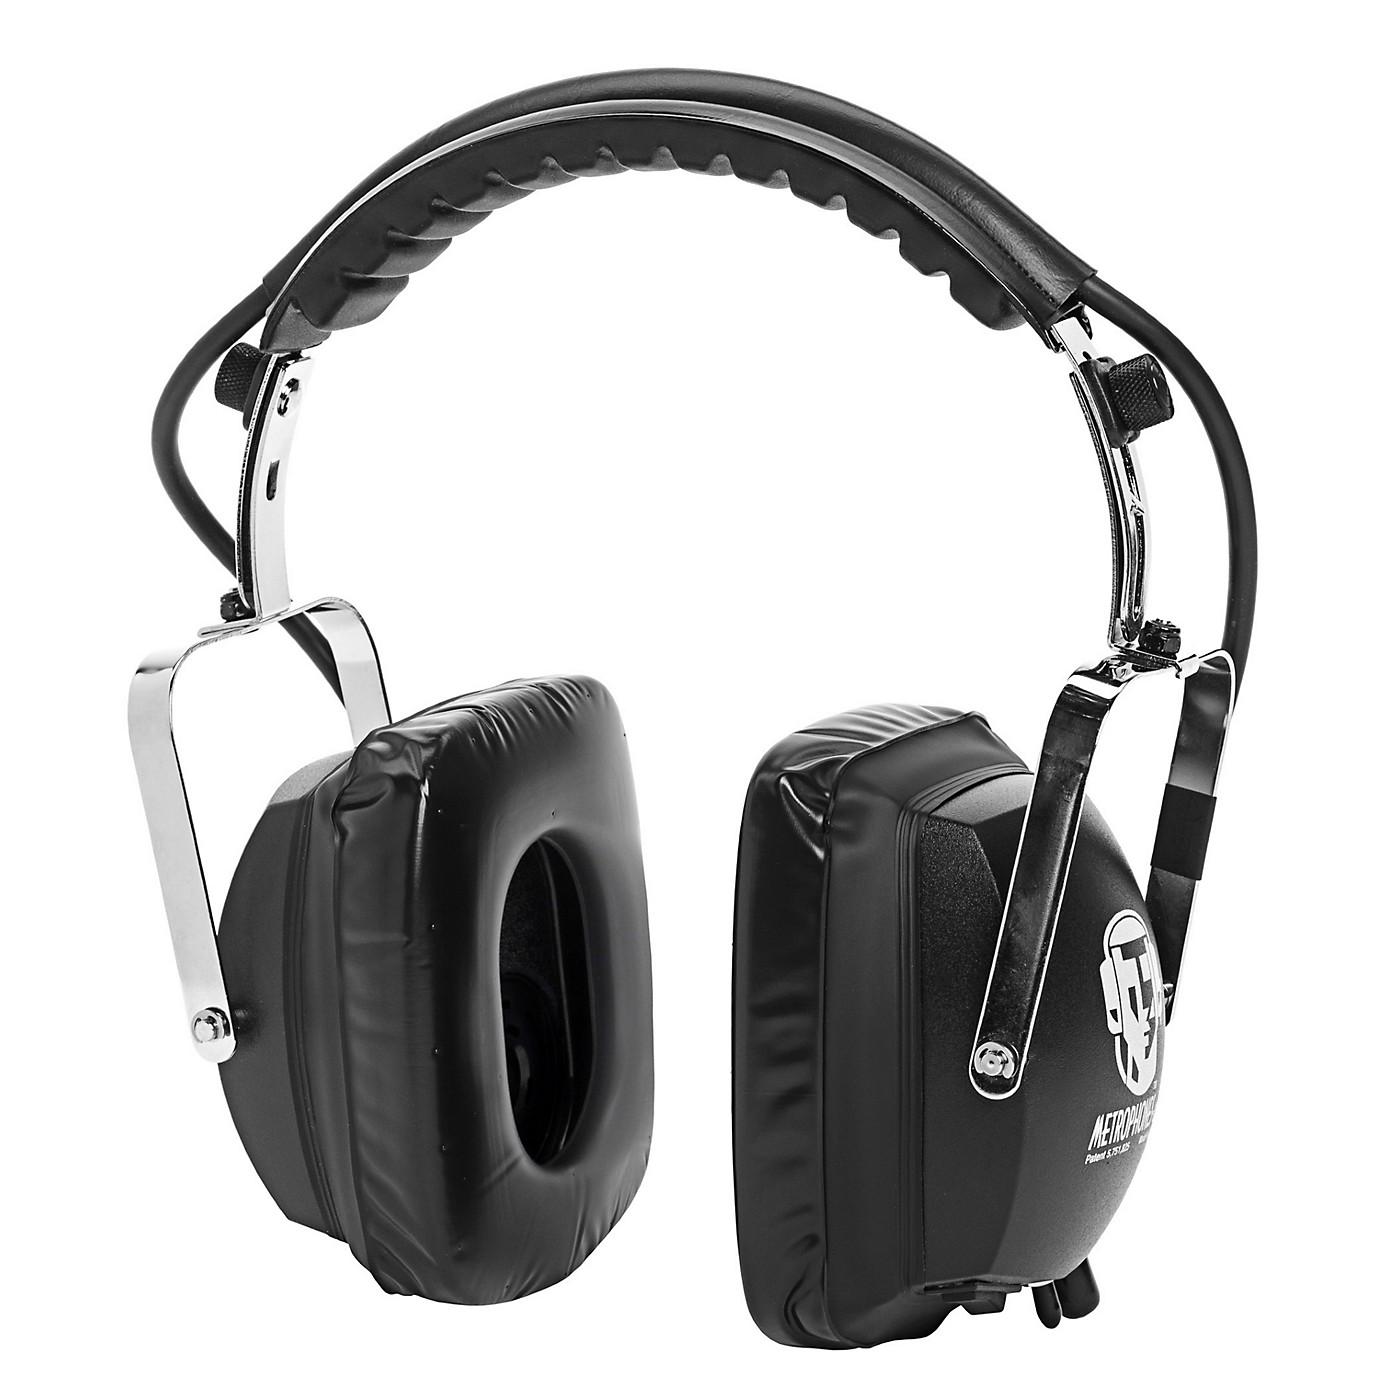 Metrophones Headphone Digital Metronome with Gel-Filled Cushions thumbnail